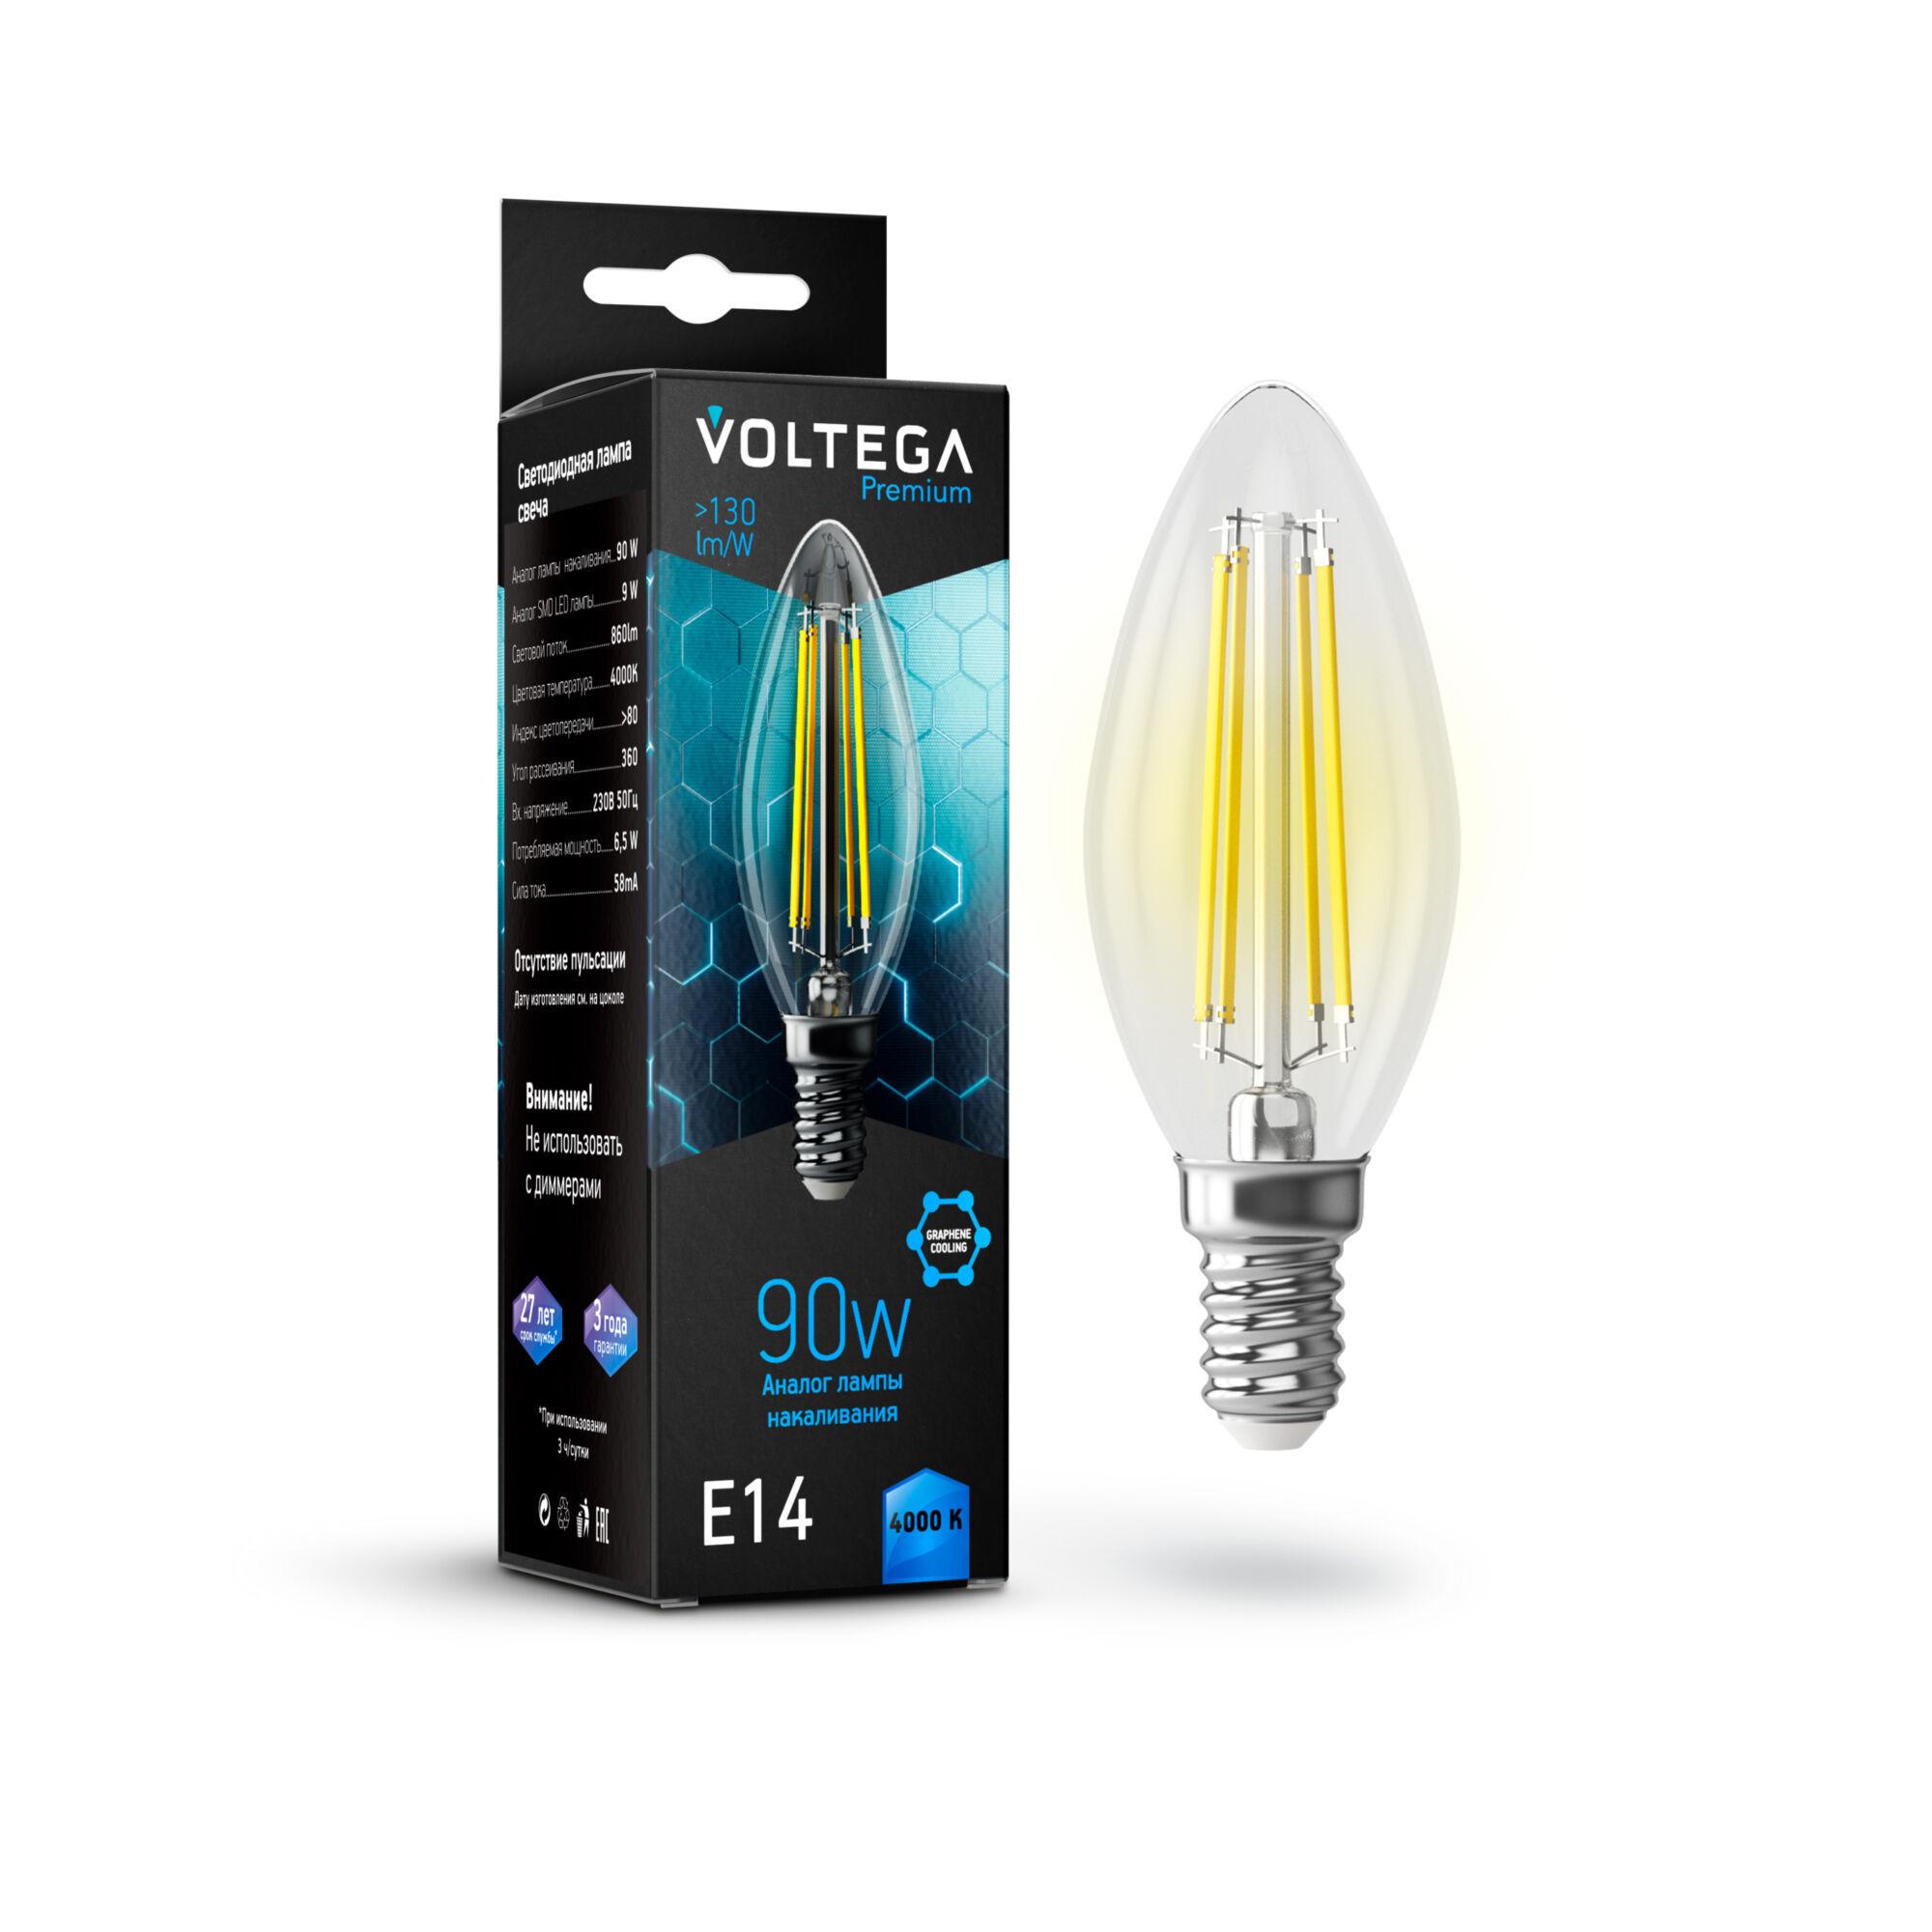 Филаментная светодиодная лампа Voltega Crystal 7135 свеча E14 6,5W, 4000K CRI80 220V, гарантия 3 года - фото 1